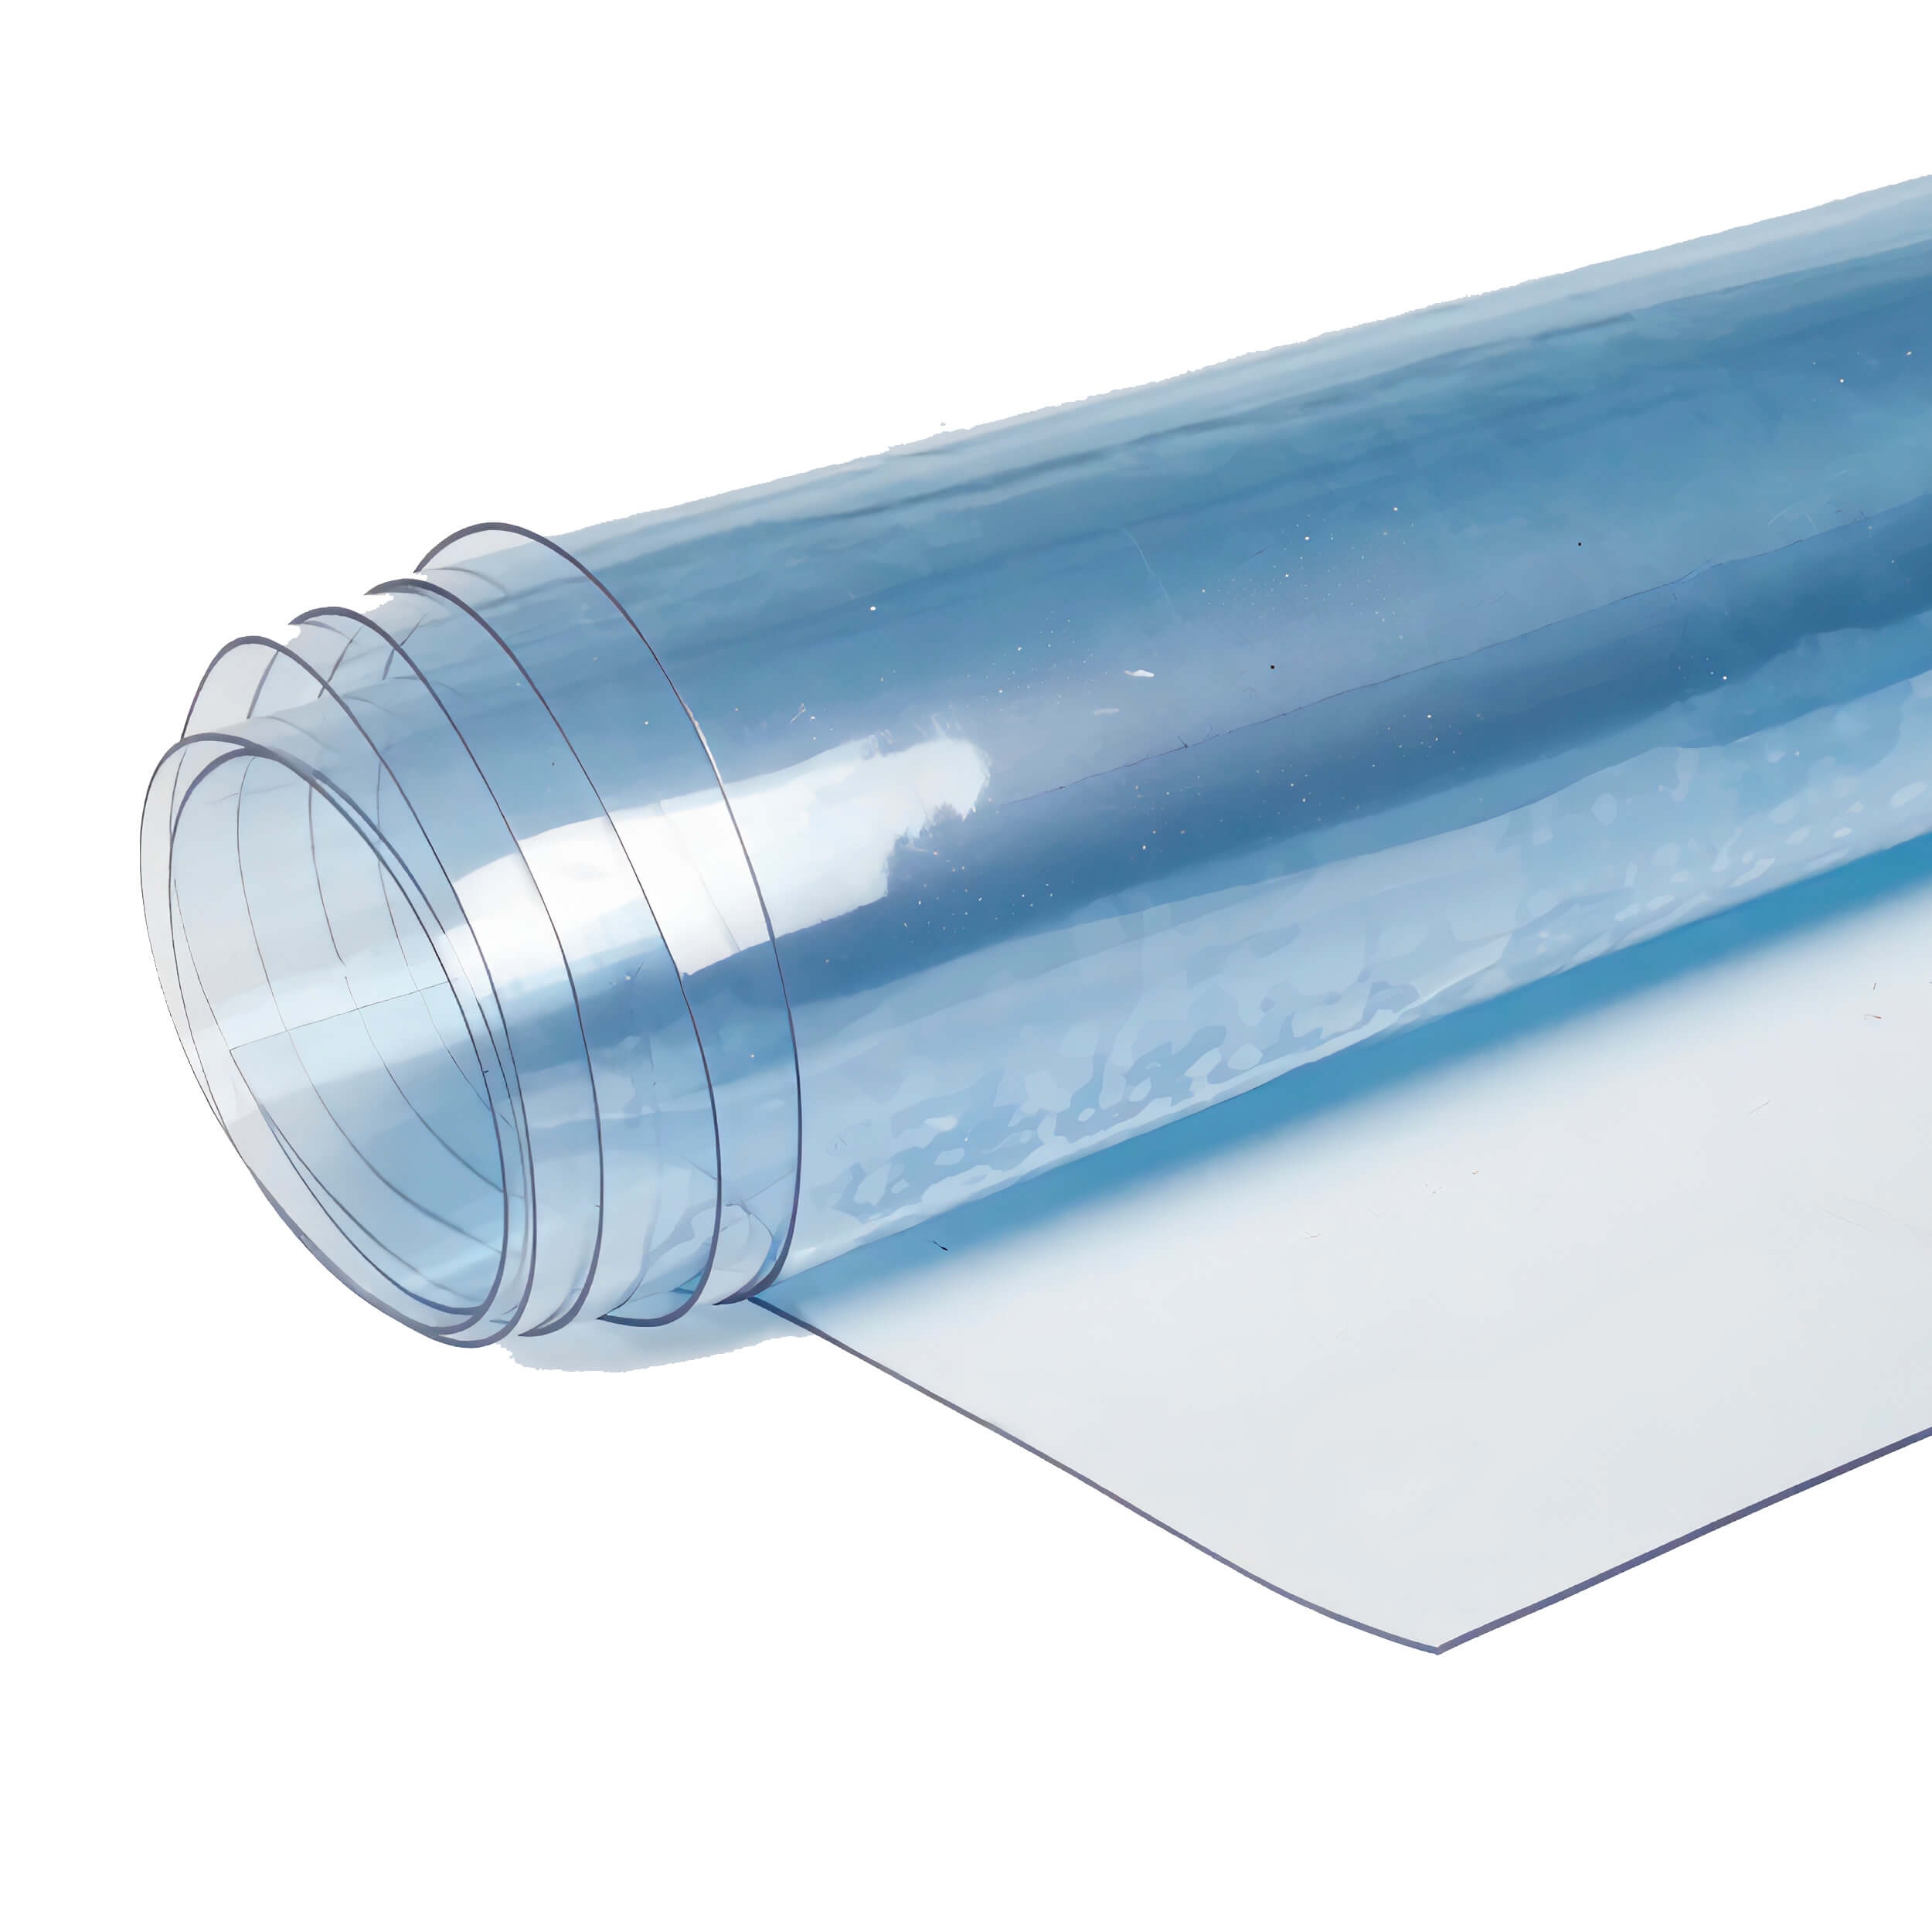 Скатерть ПВХ для фасовочного стола (140х160 см) фото